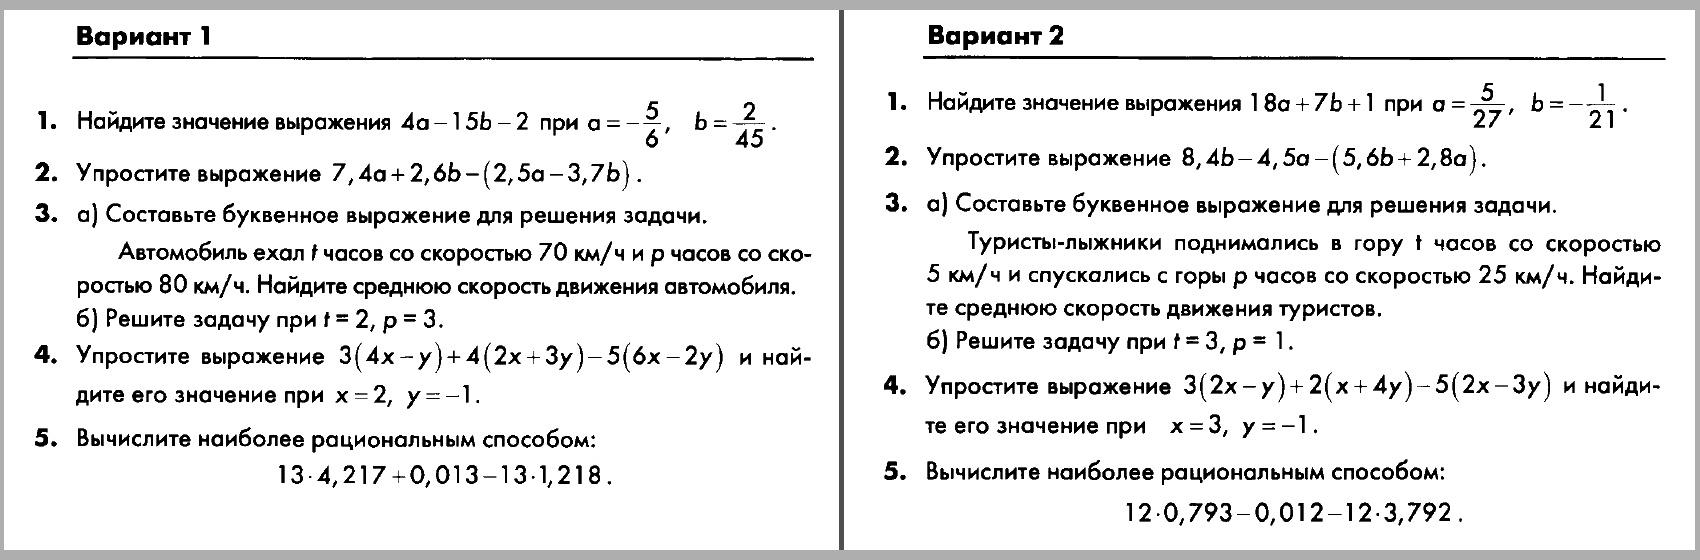 Алгебра 7 Макарычев Глазков КР-01